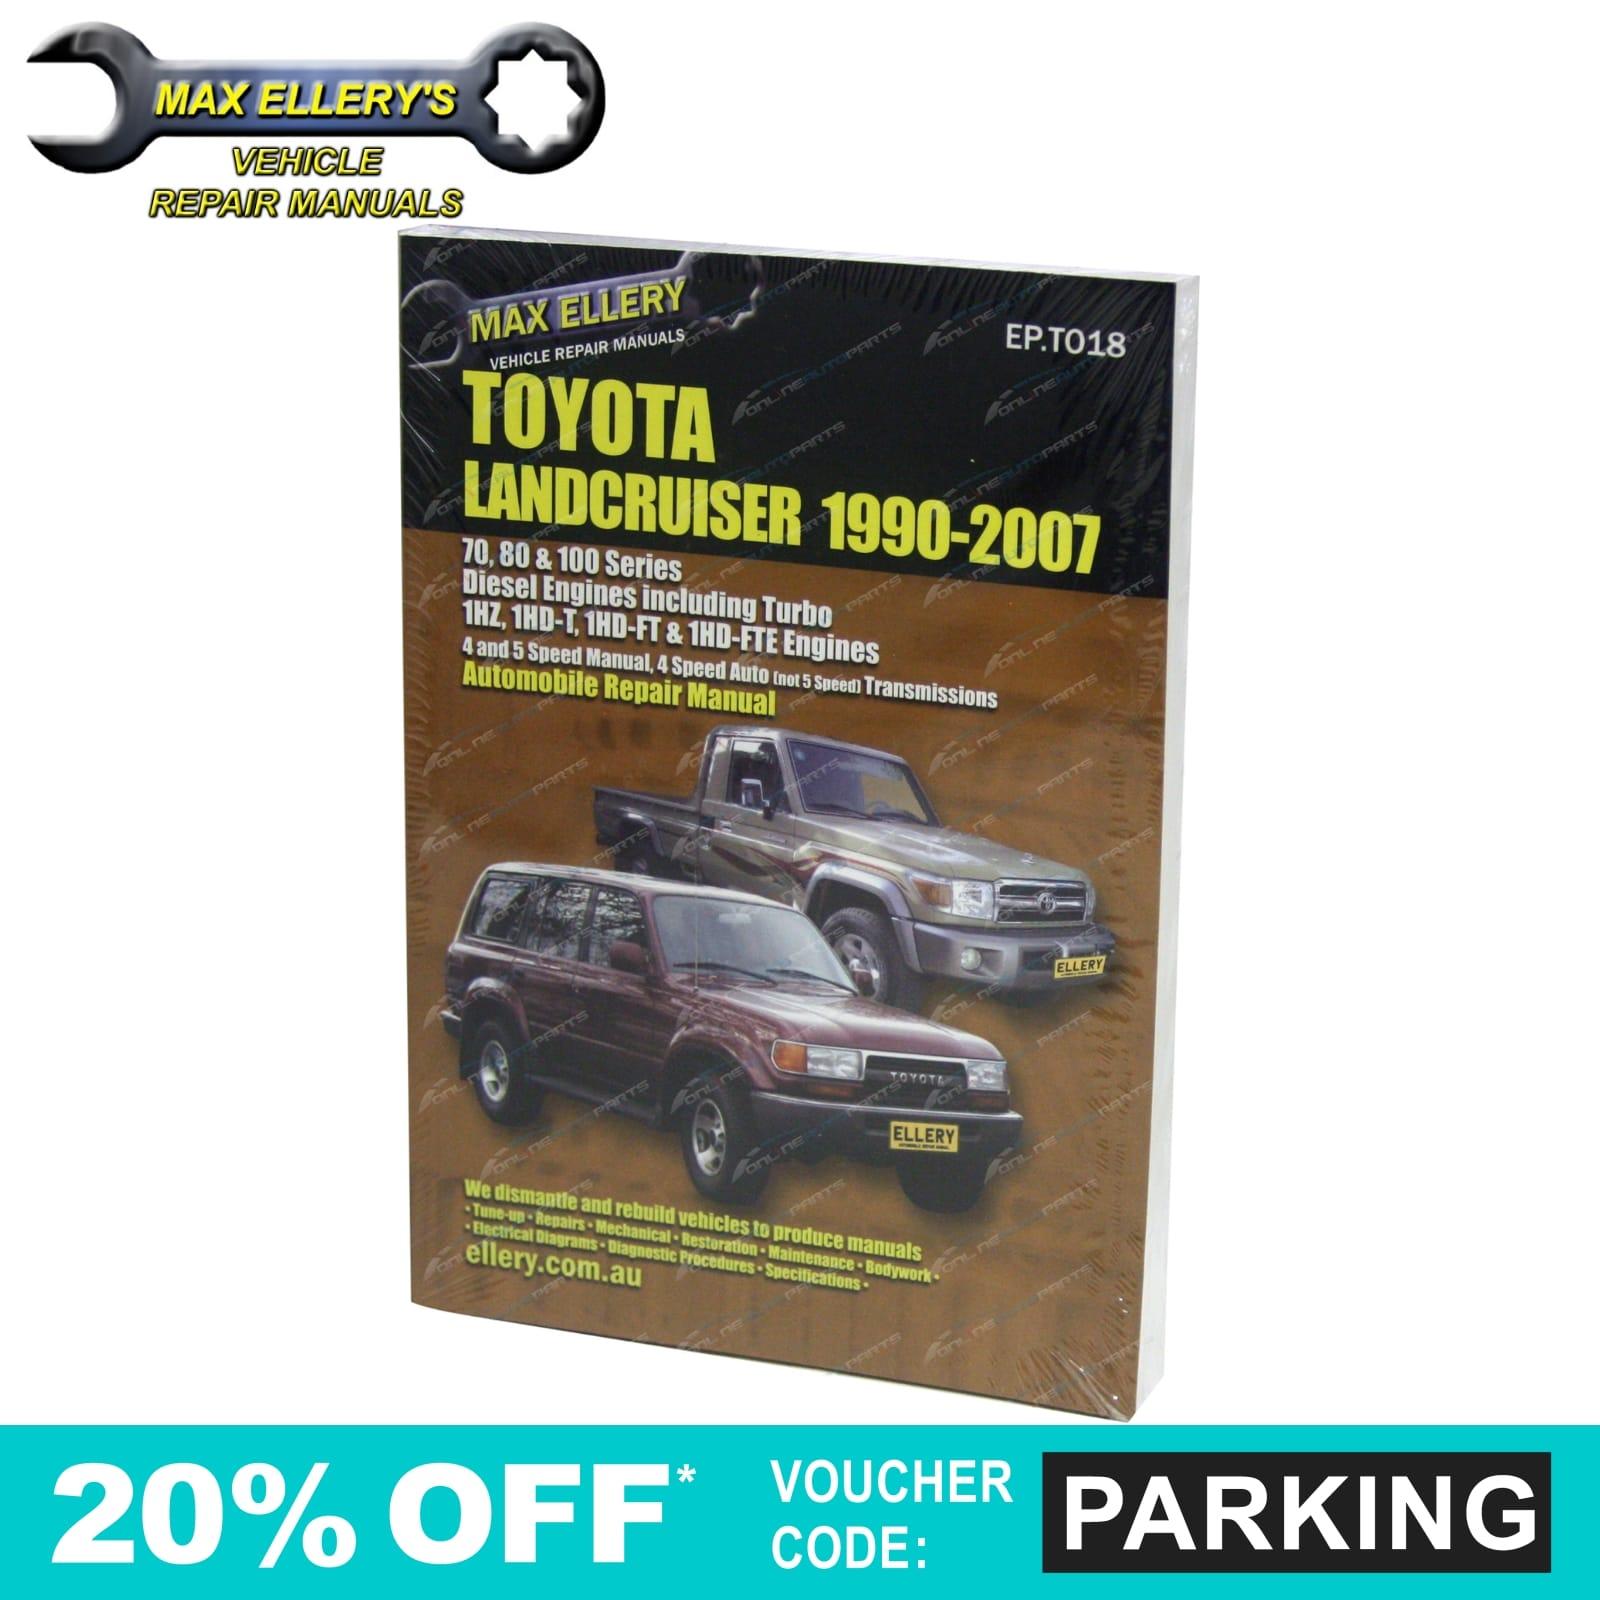 workshop repair manual suits landcruiser 80 100 series diesel 1hz rh ebay com toyota landcruiser 100 series workshop manual pdf Lifted Land Cruiser 100 Series